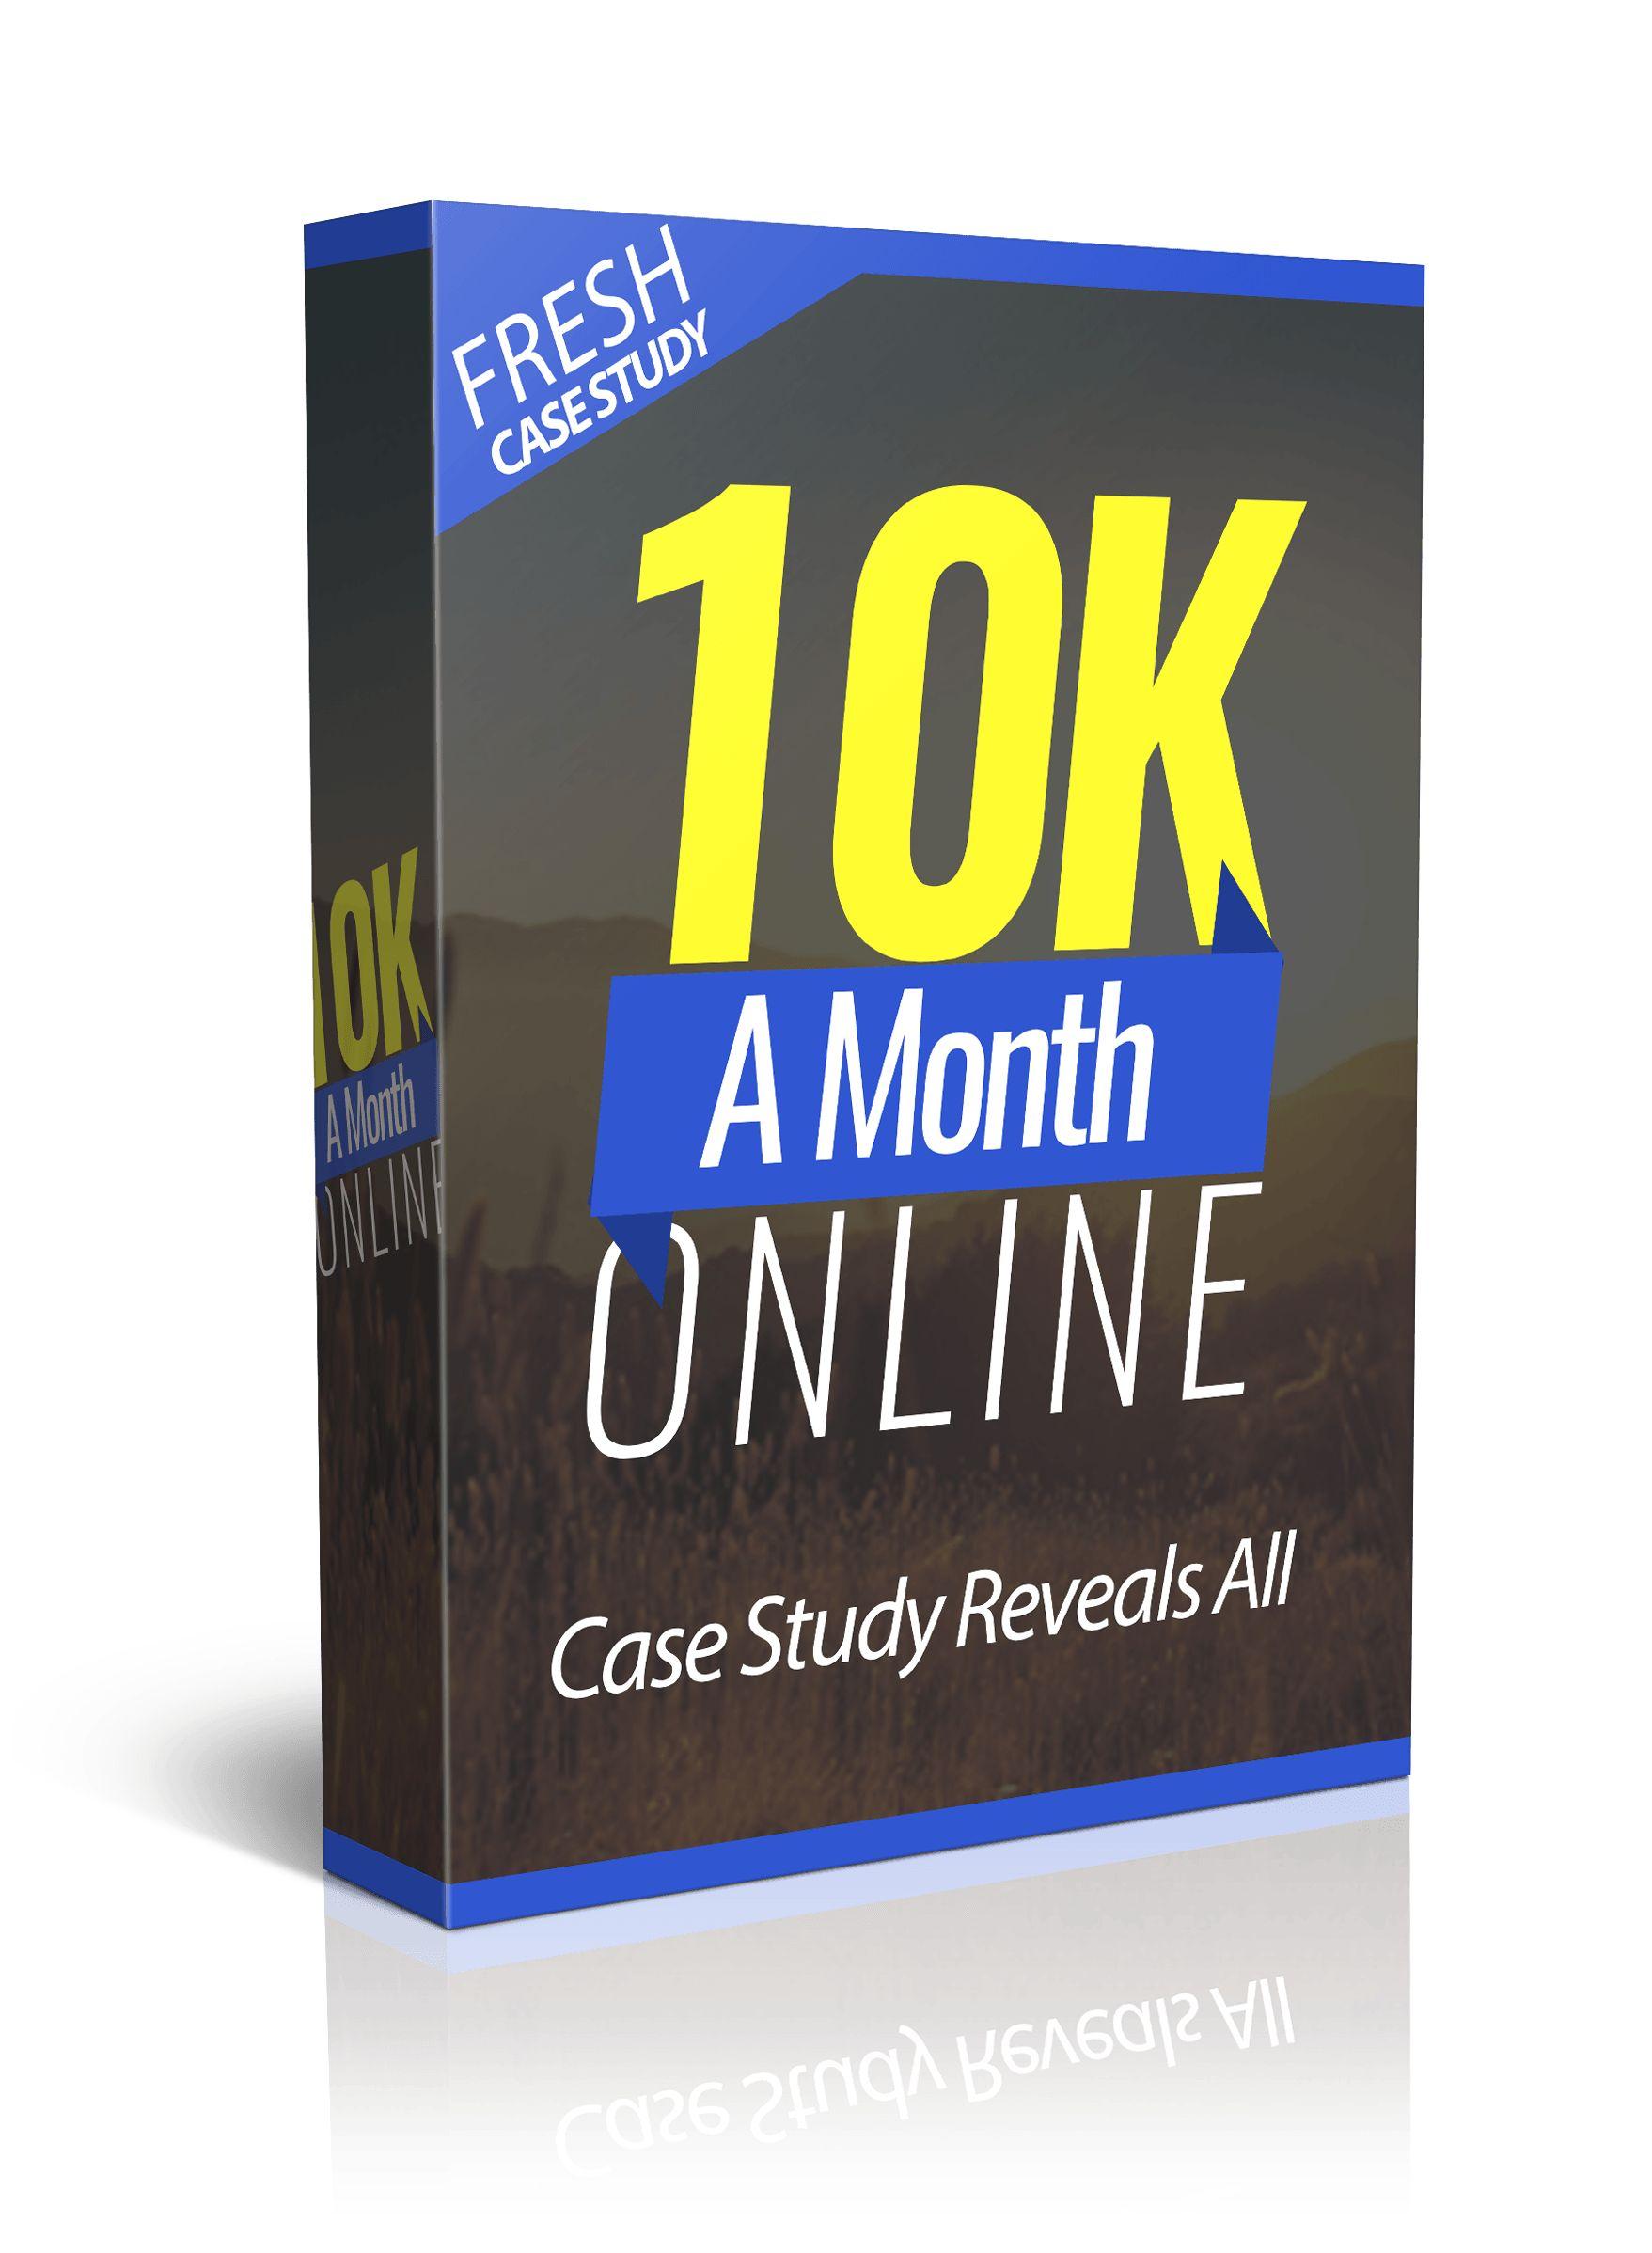 1. 10K A Month Online